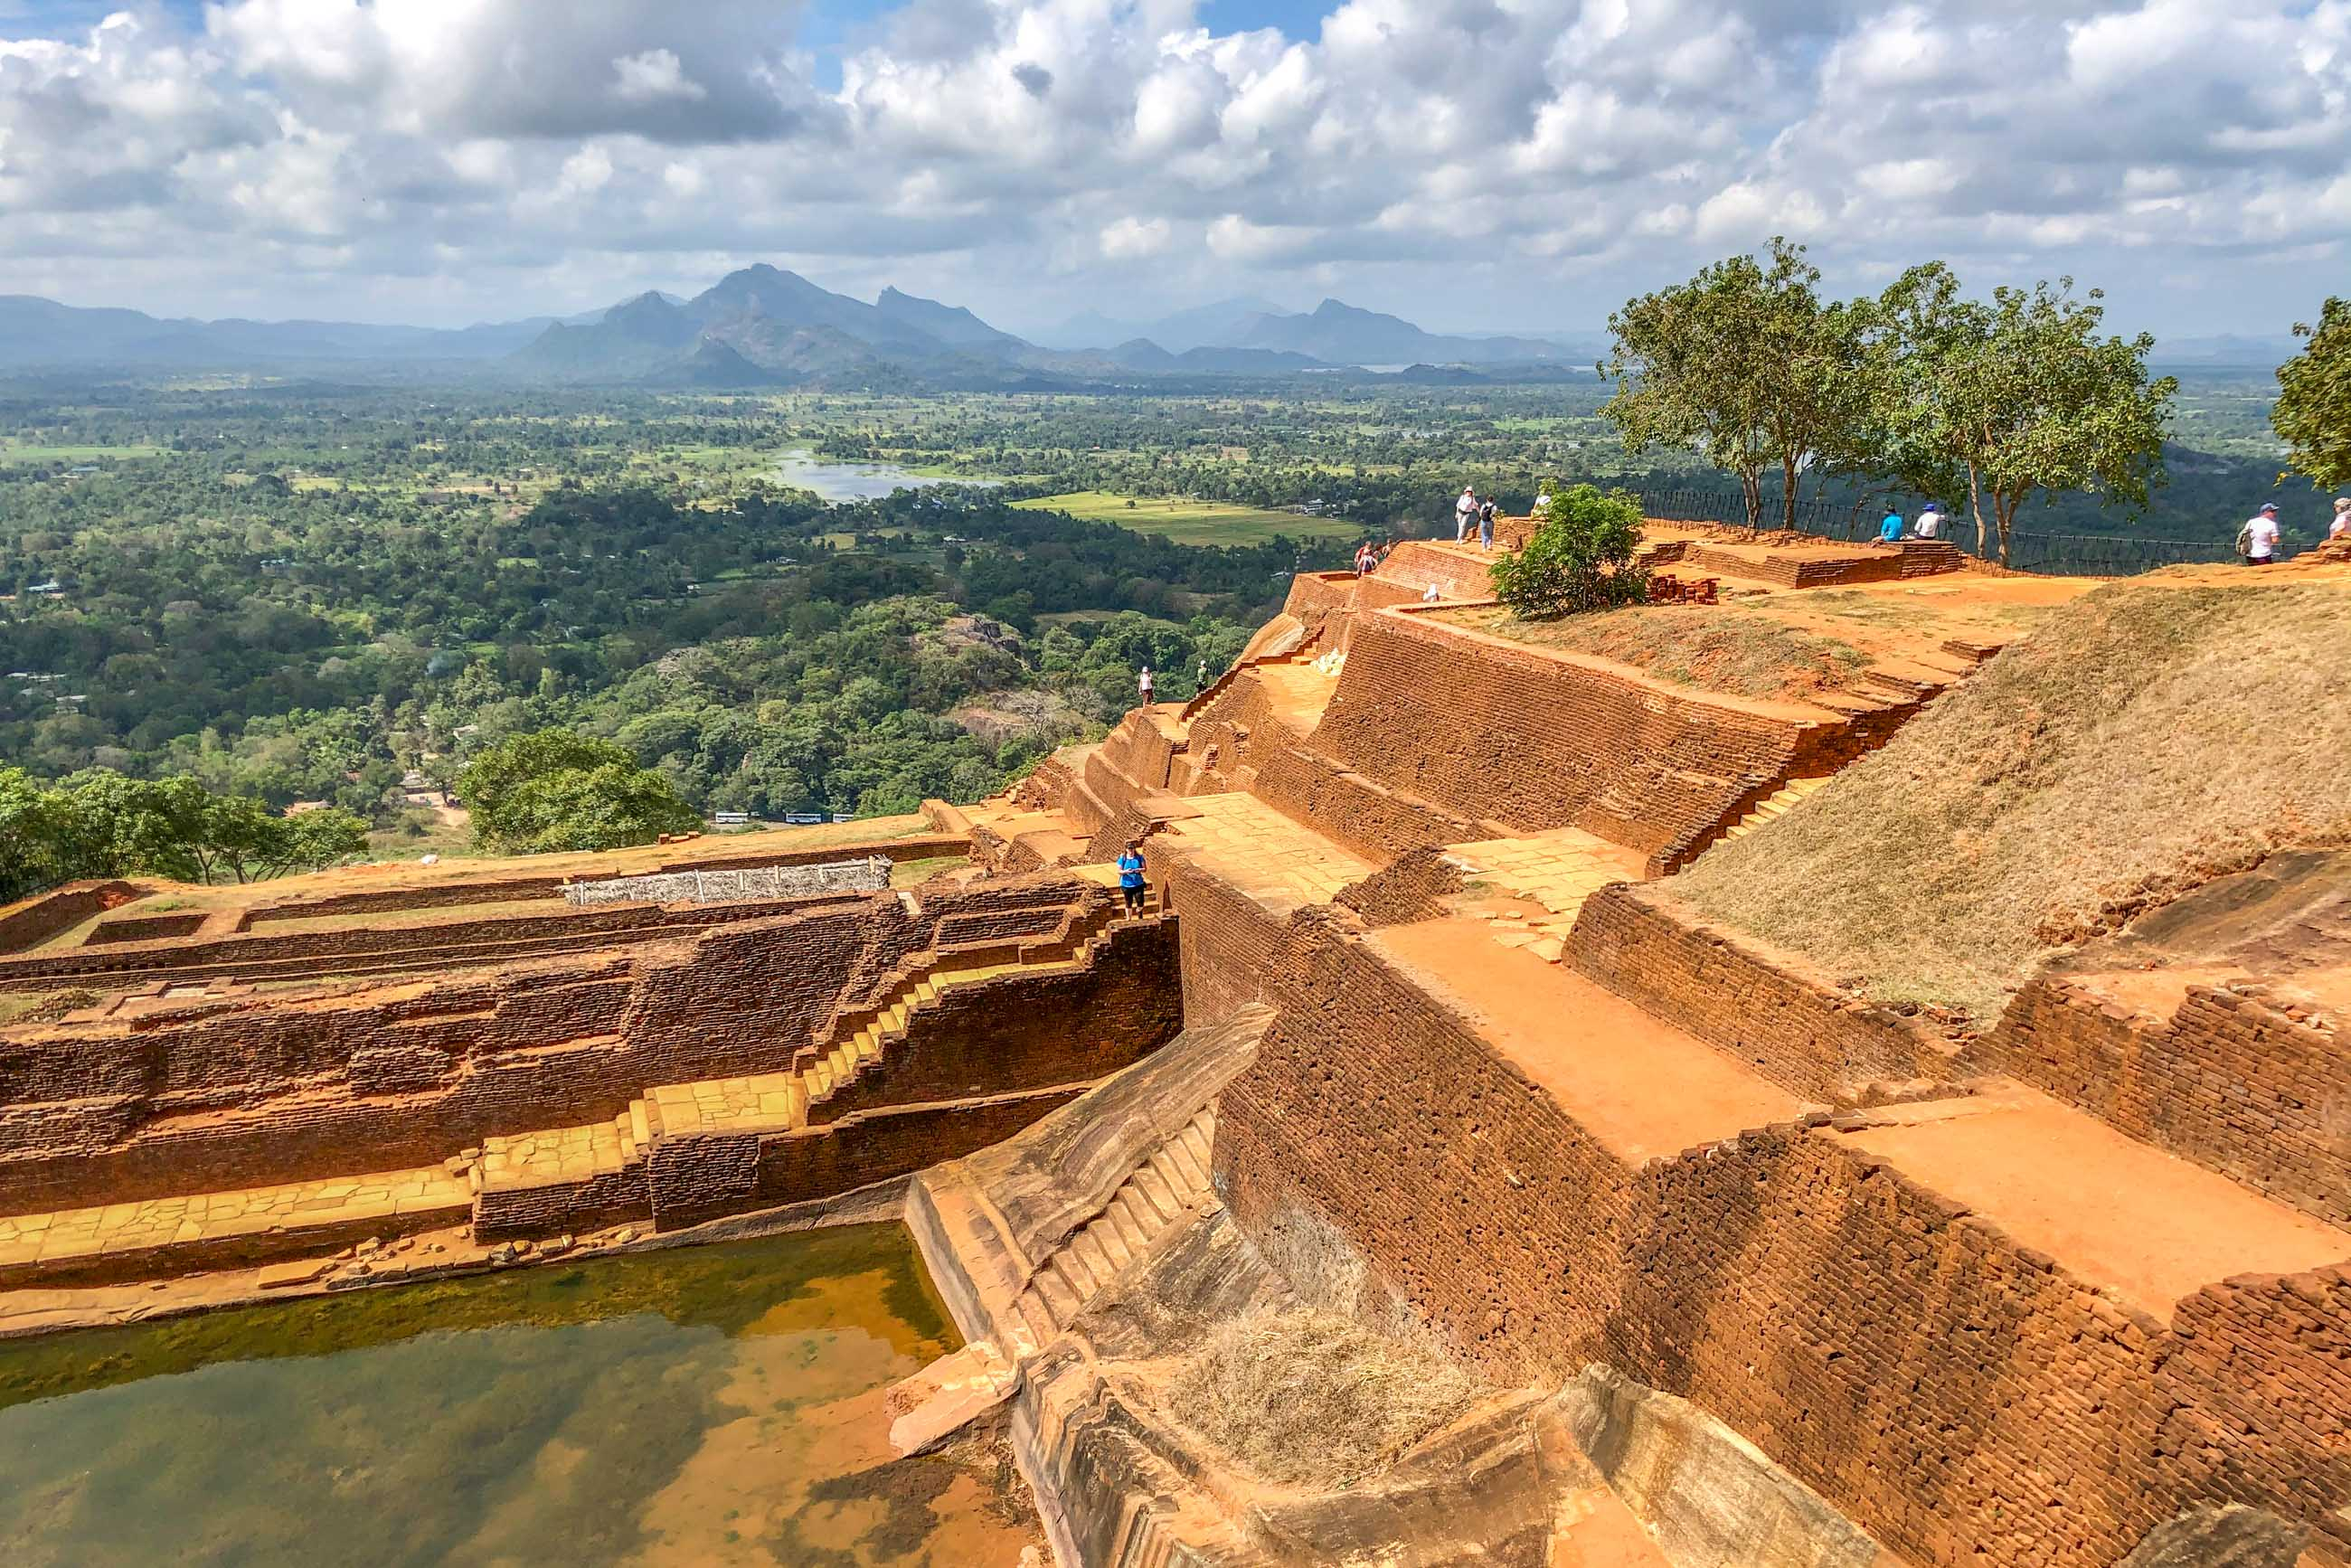 https://bubo.sk/uploads/galleries/5058/roberttaraba_srilanka_5.jpg